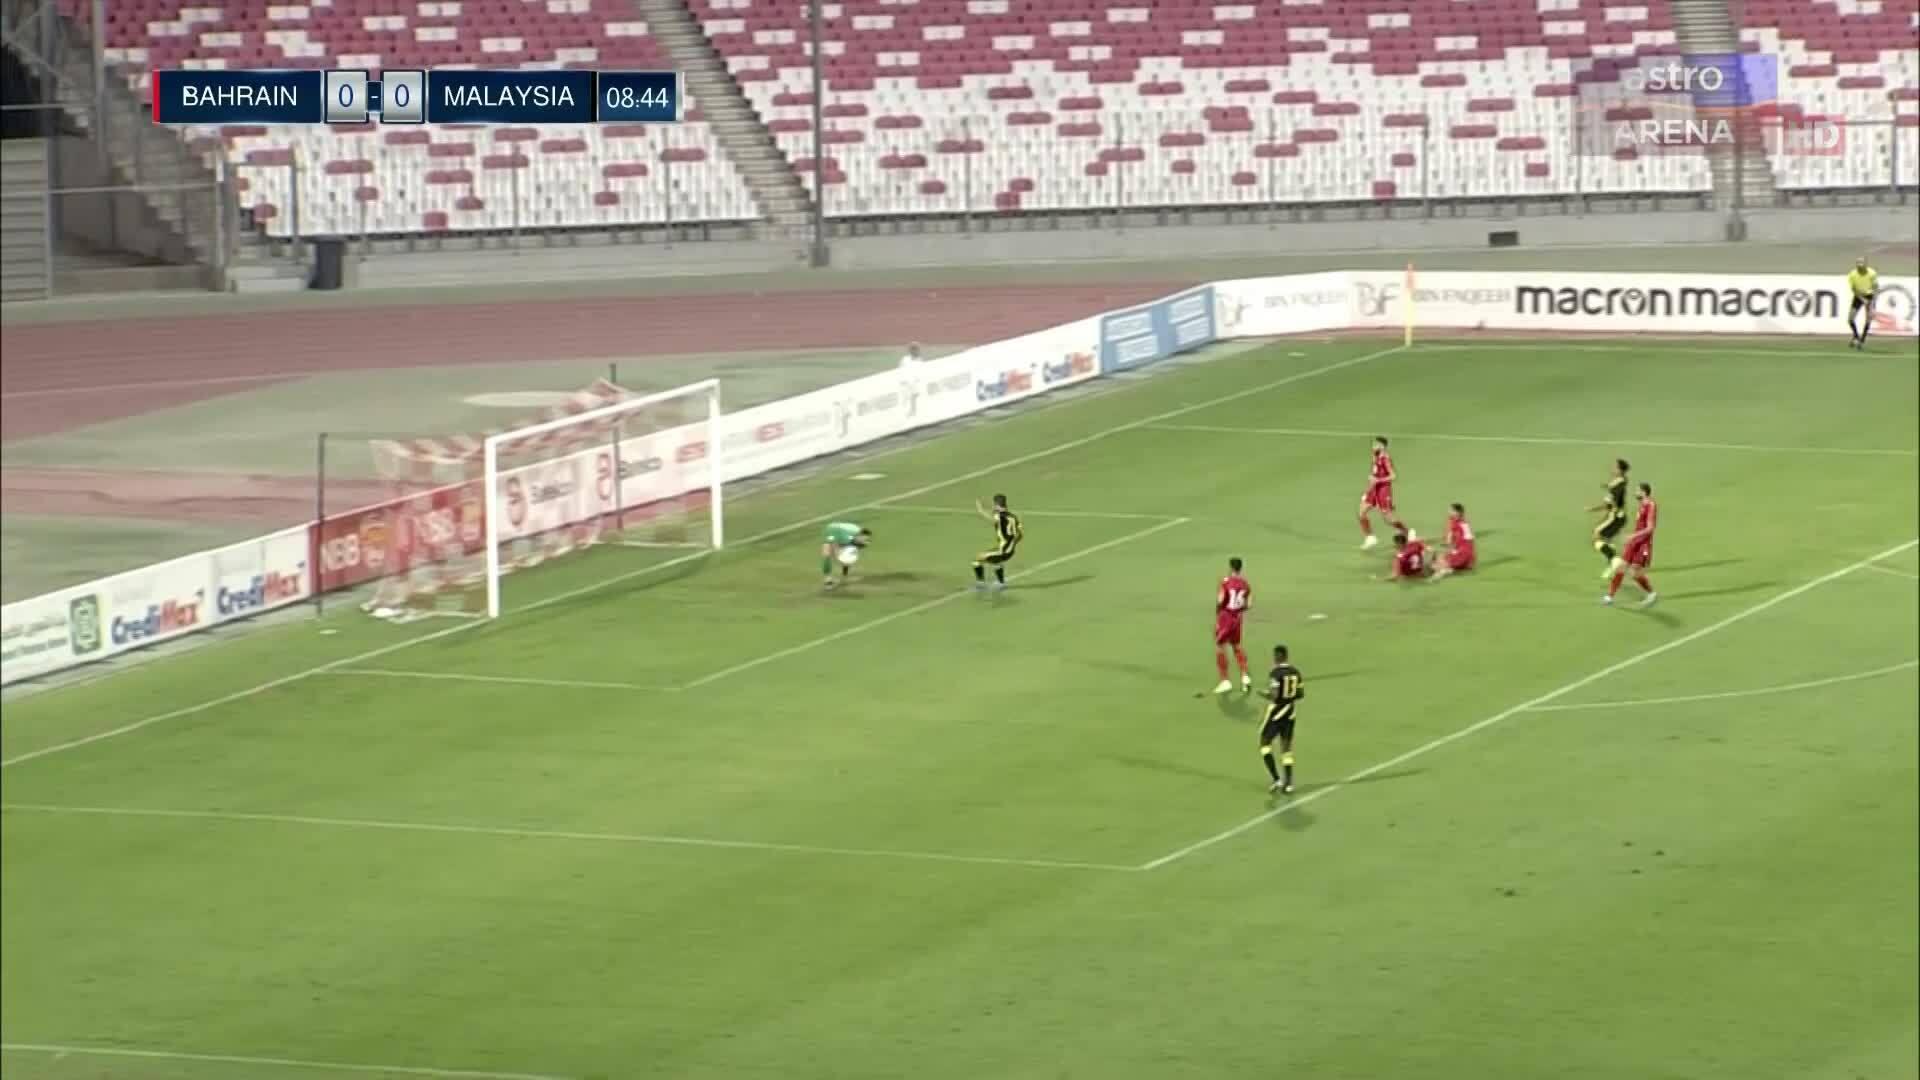 Malaysia 0-2 Bahrain